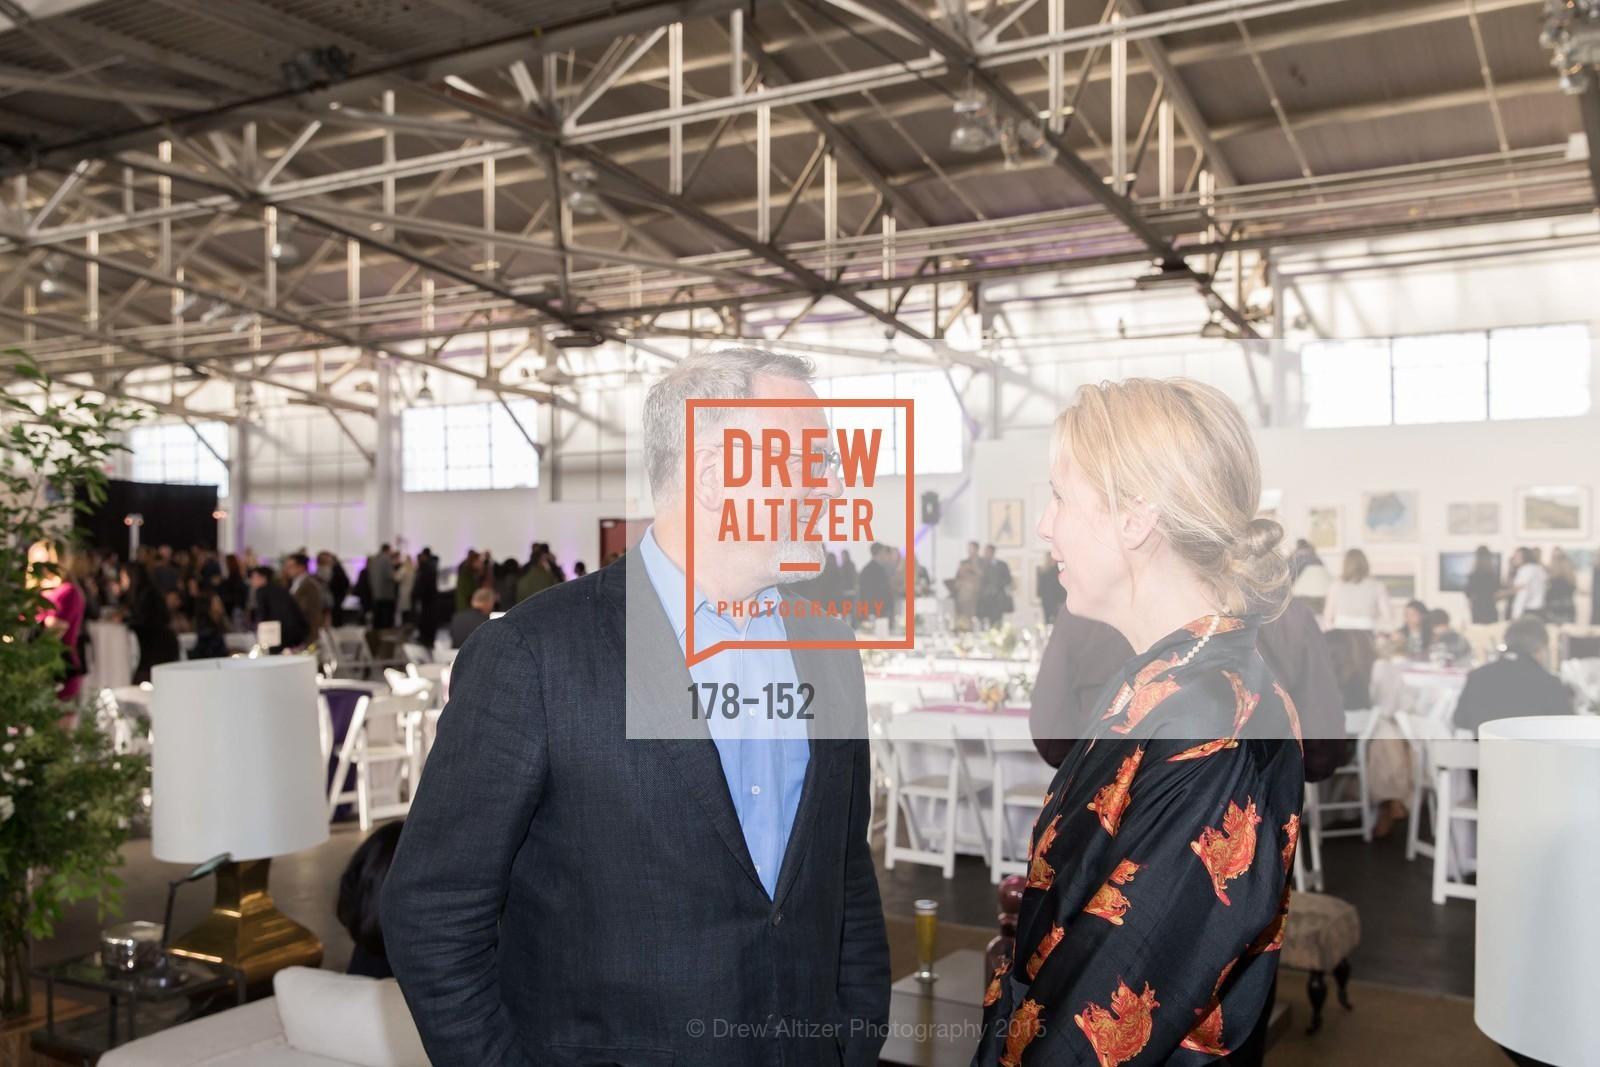 Nion McEvoy, Lauren Goodman, Headlands Center for the Arts Benefit Auction, Fort Mason Festival, Pavilon, June 2nd, 2015,Drew Altizer, Drew Altizer Photography, full-service agency, private events, San Francisco photographer, photographer california